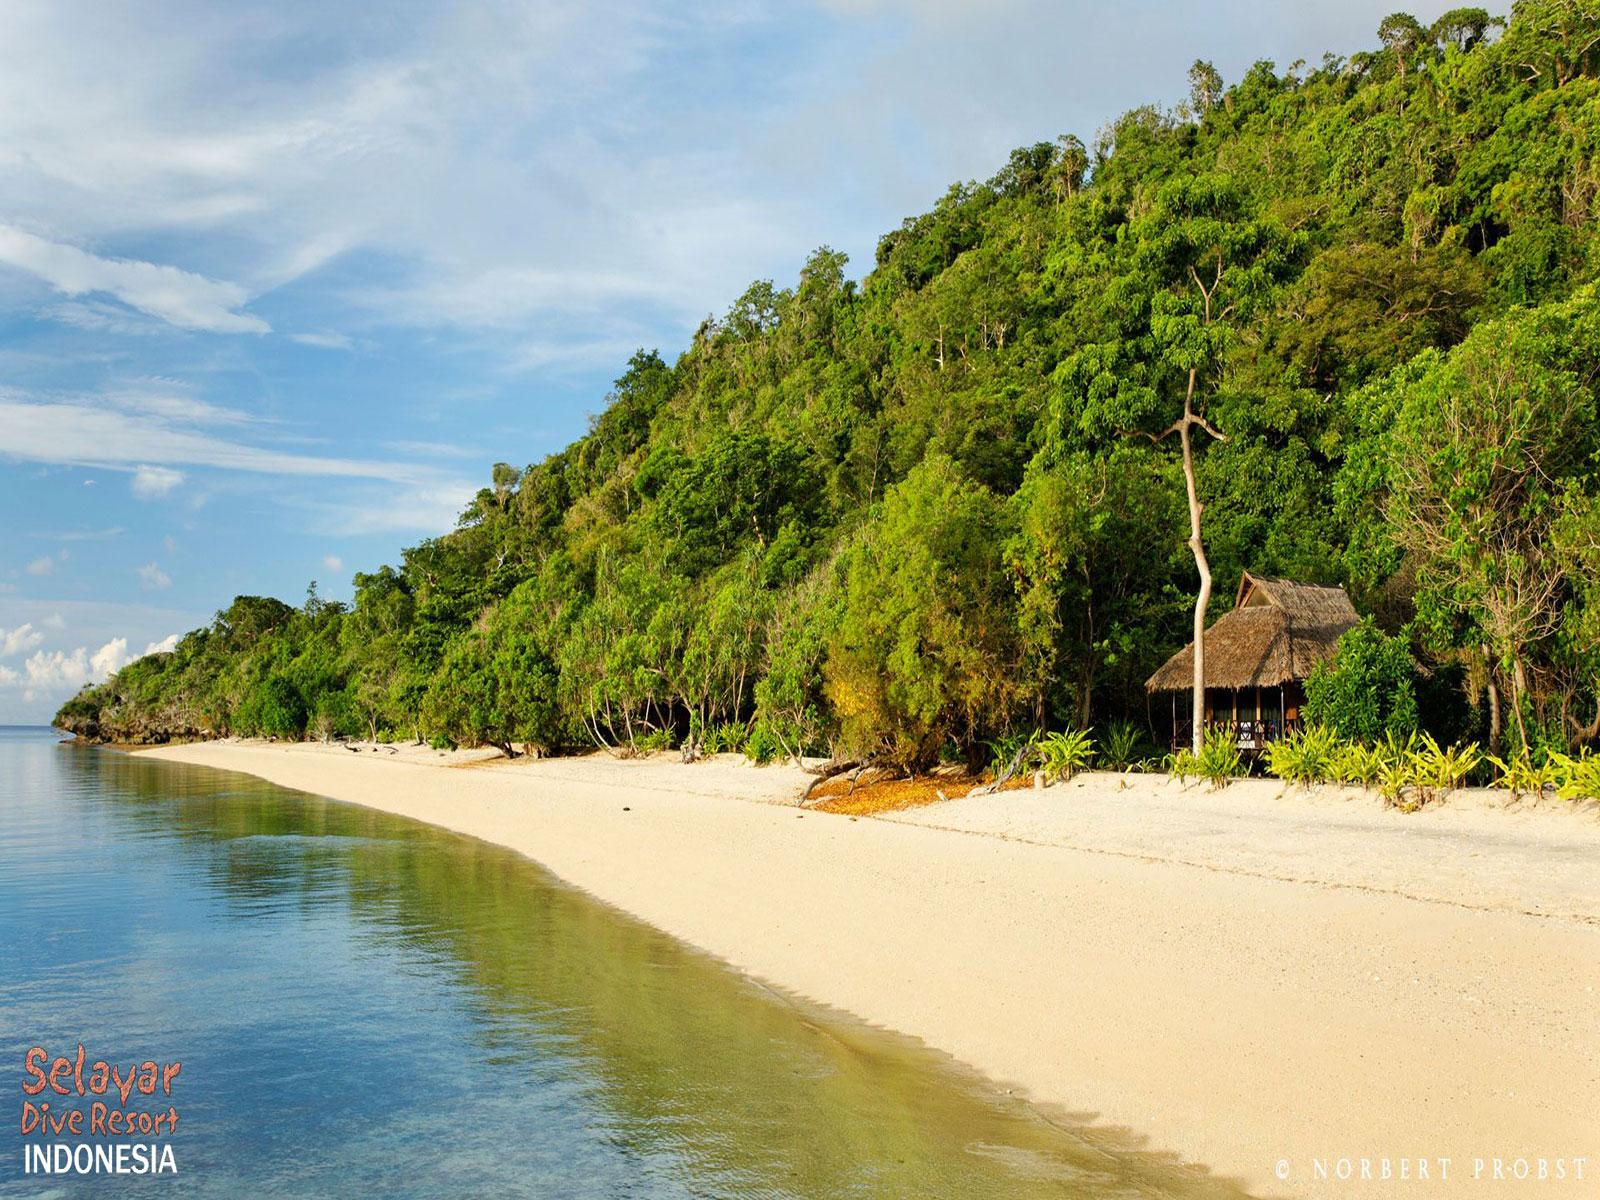 rondreis sulawesi selayar selayar dive resort hotel 1